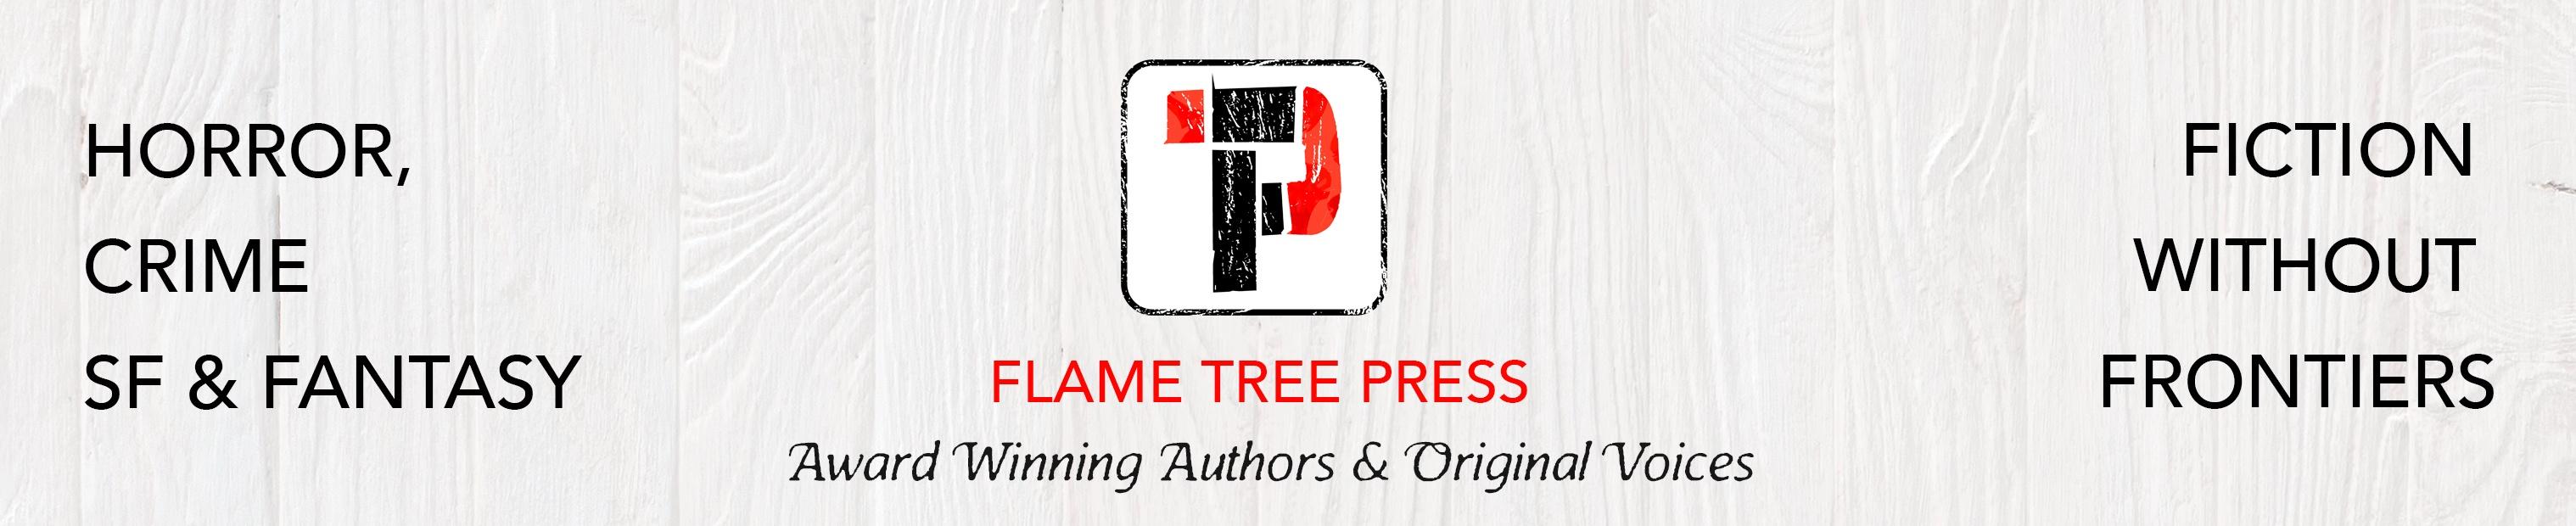 Header - Flame Tree Press - Horror, Crime, SF & Fantasy